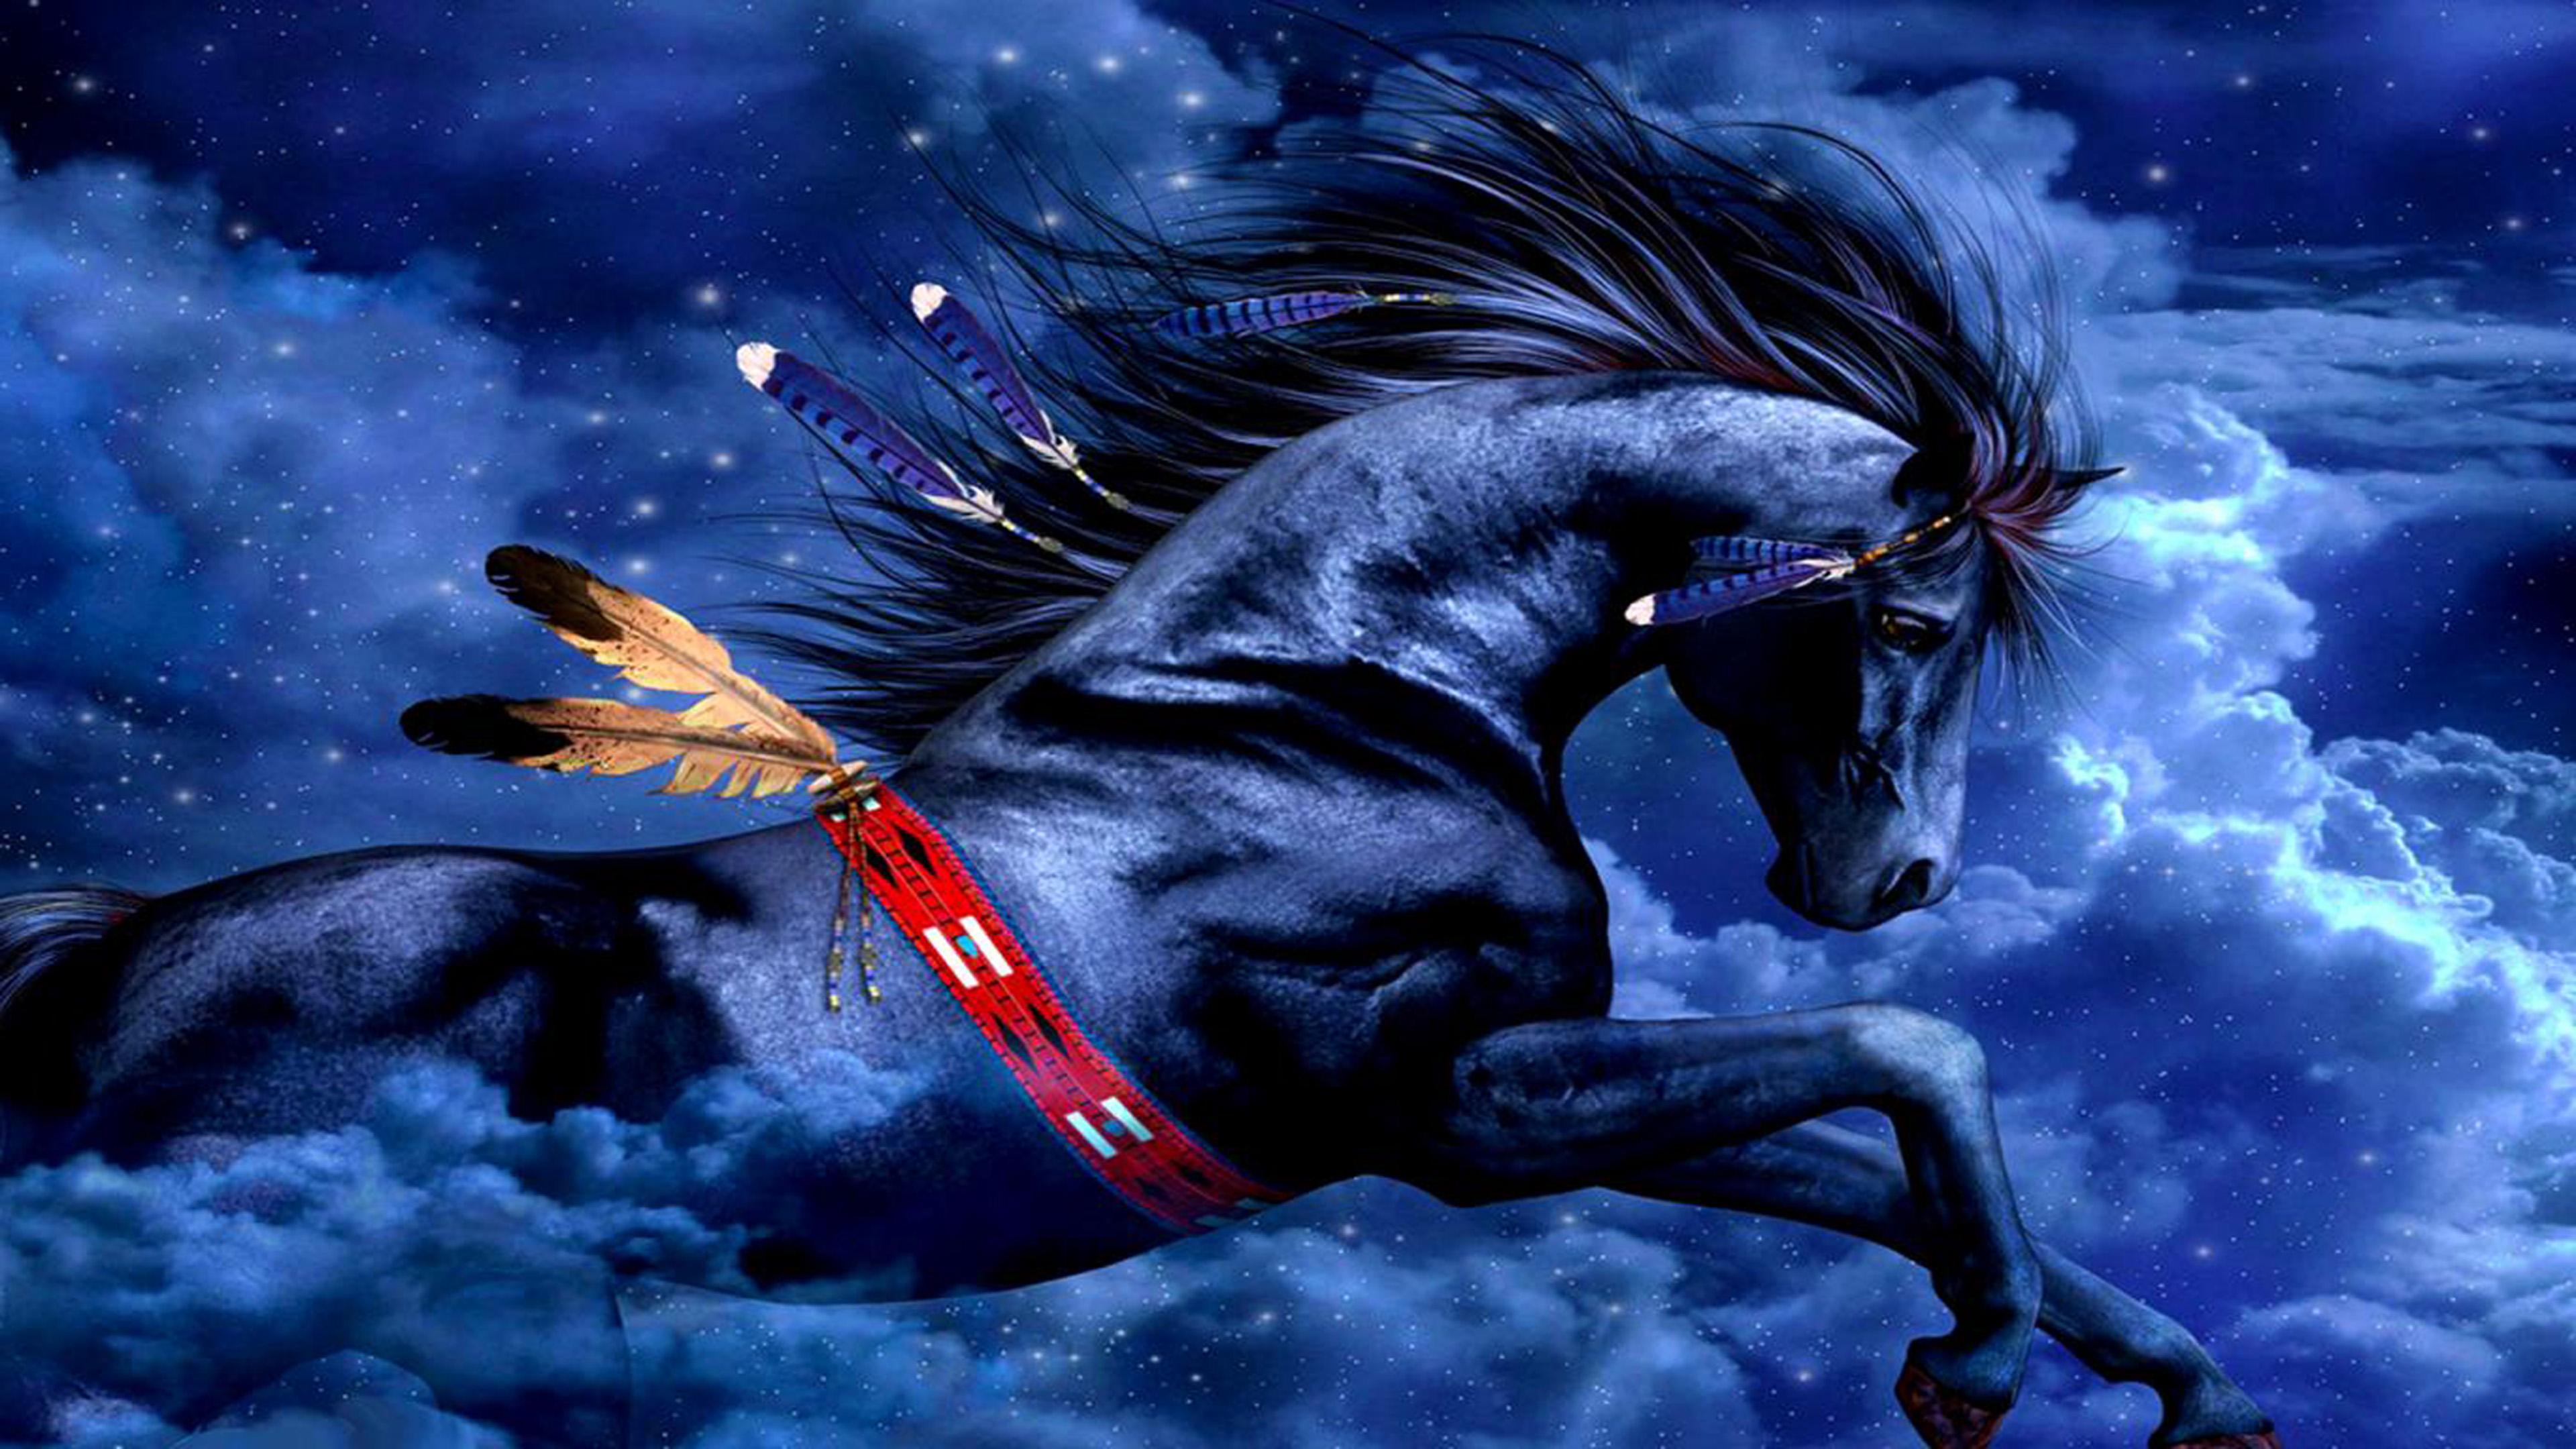 Indian Horse Wallpaper Horse 3d Wallpaper Hd 934611 Hd Wallpaper Backgrounds Download